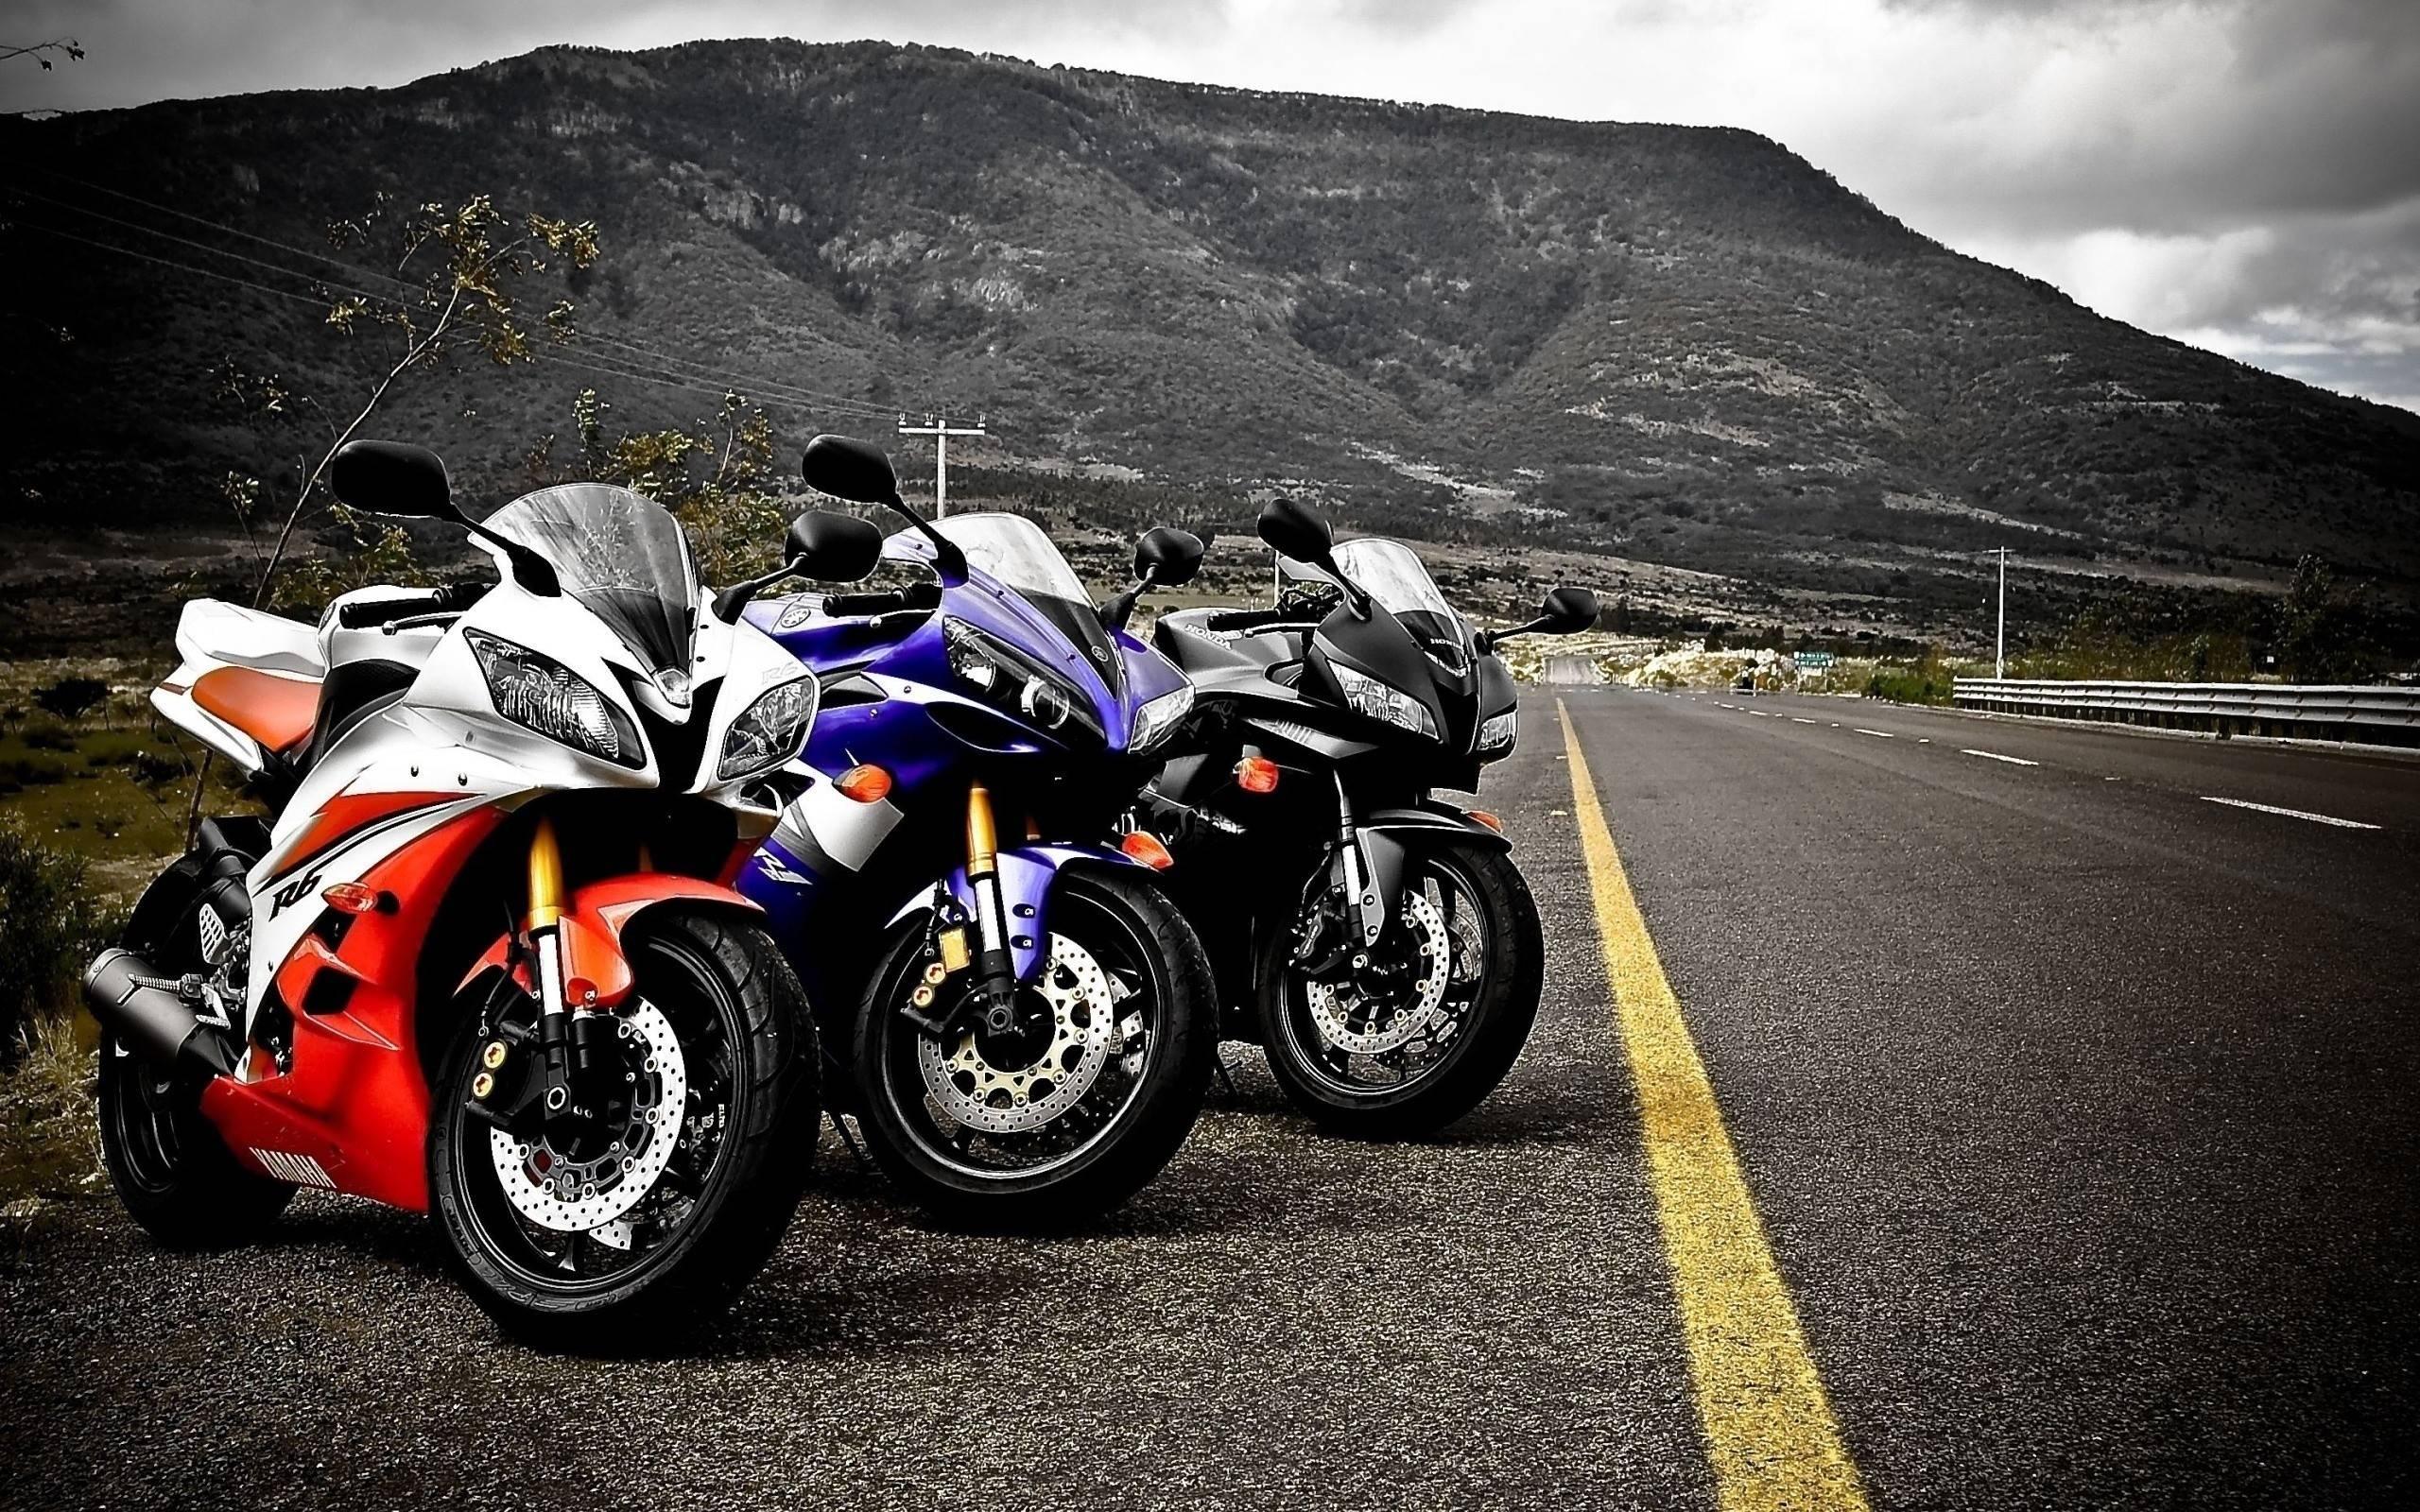 Yamaha YZFR Red HD Wallpaper Motorcycles HD Wallpaper